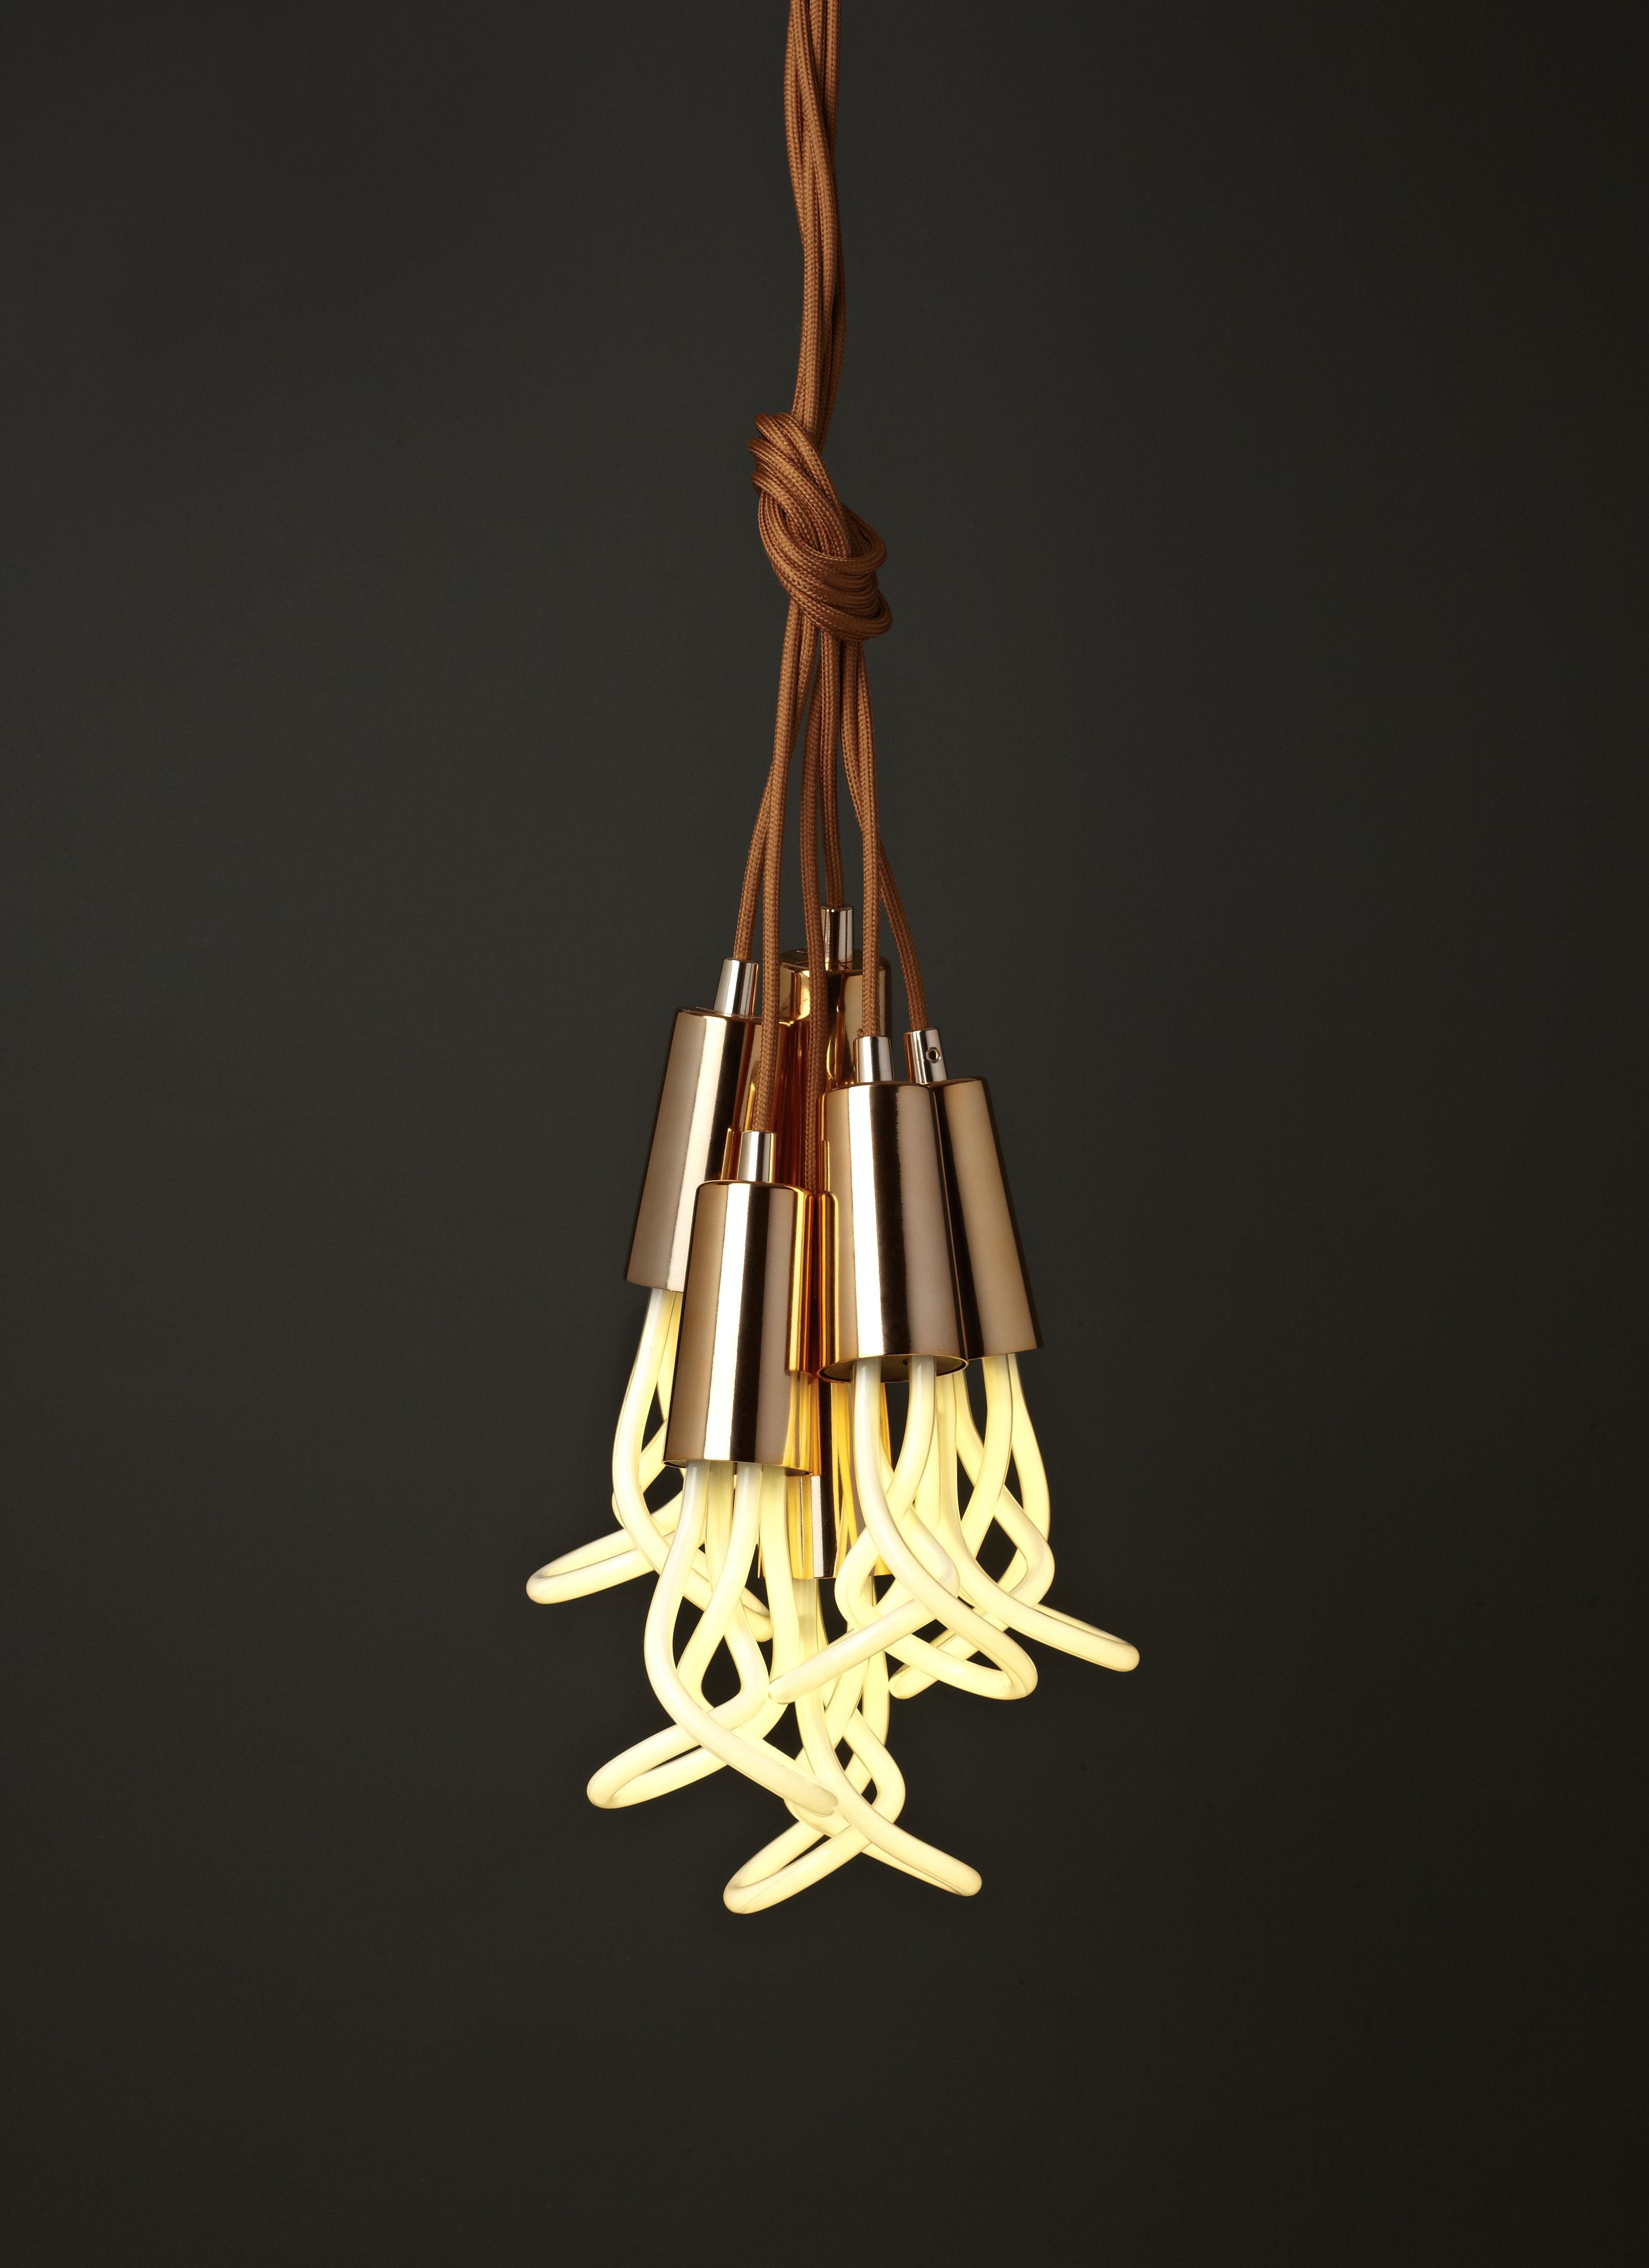 suspension set c ble cache douille cuivre plumen made in design. Black Bedroom Furniture Sets. Home Design Ideas